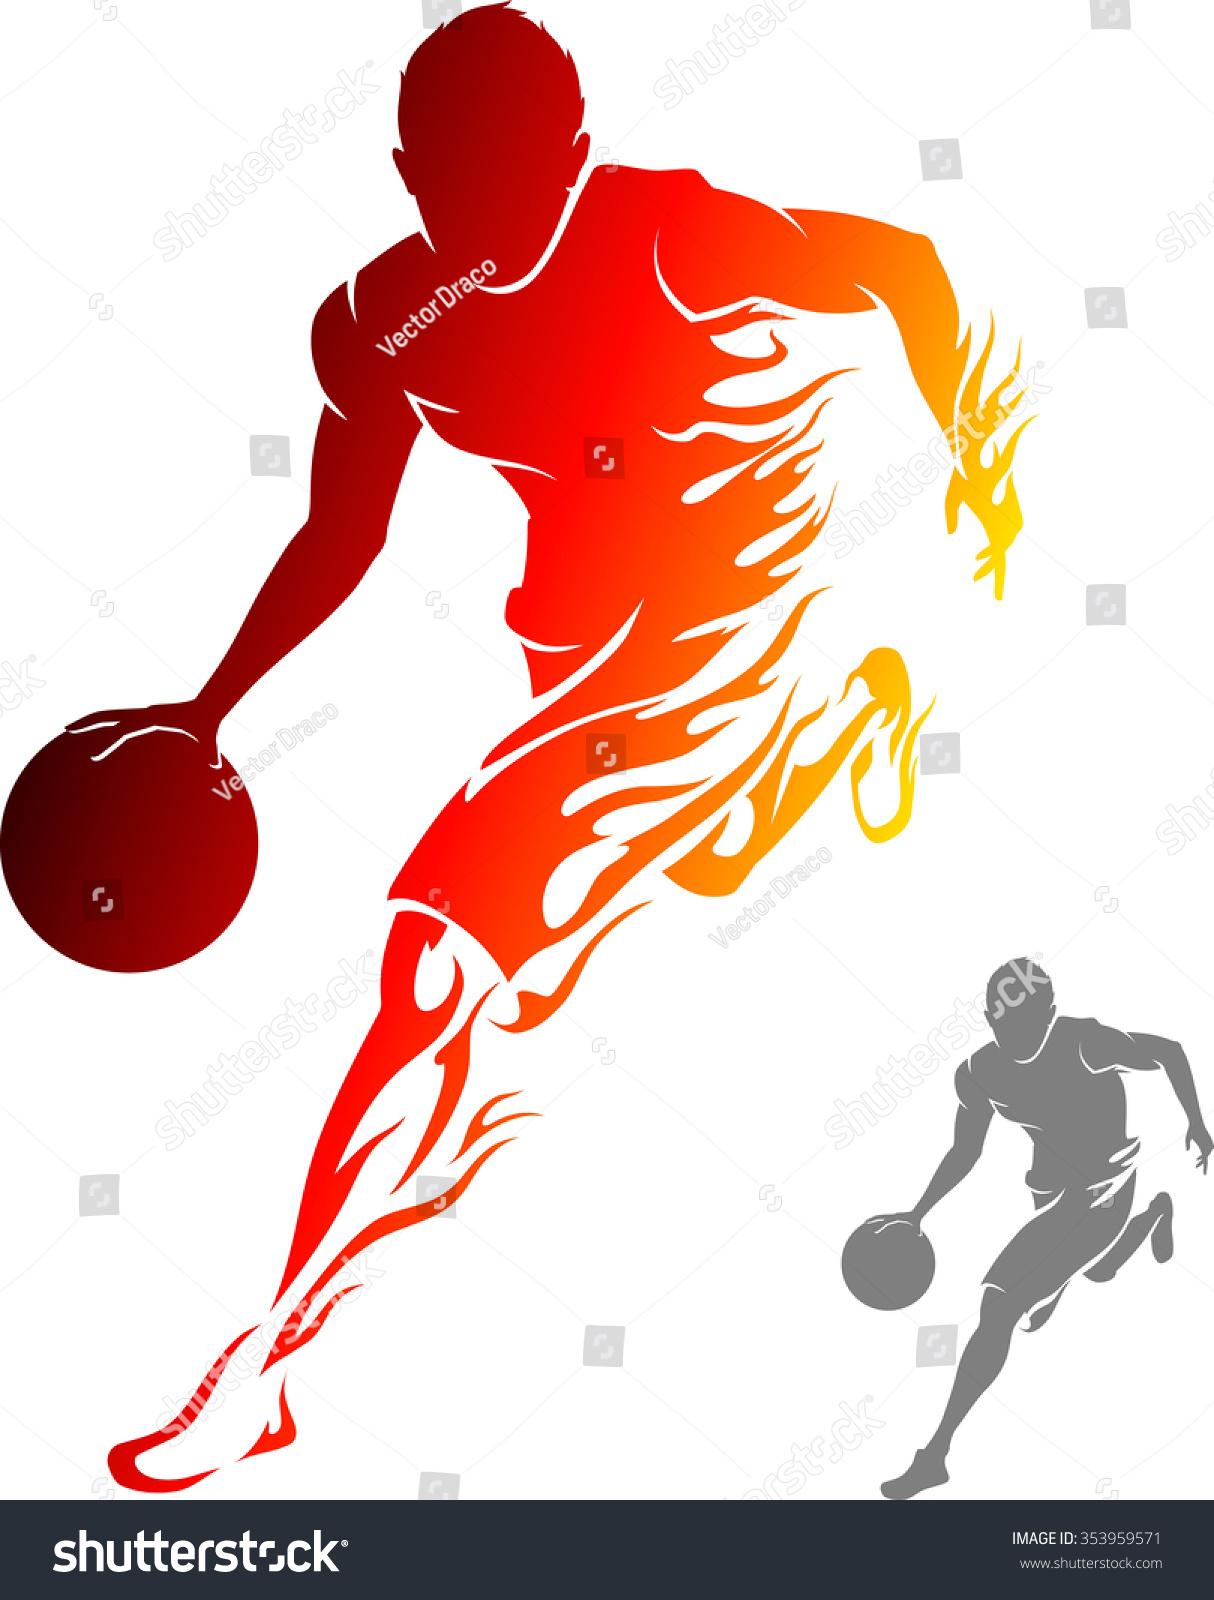 Basketball player dribbling clipart